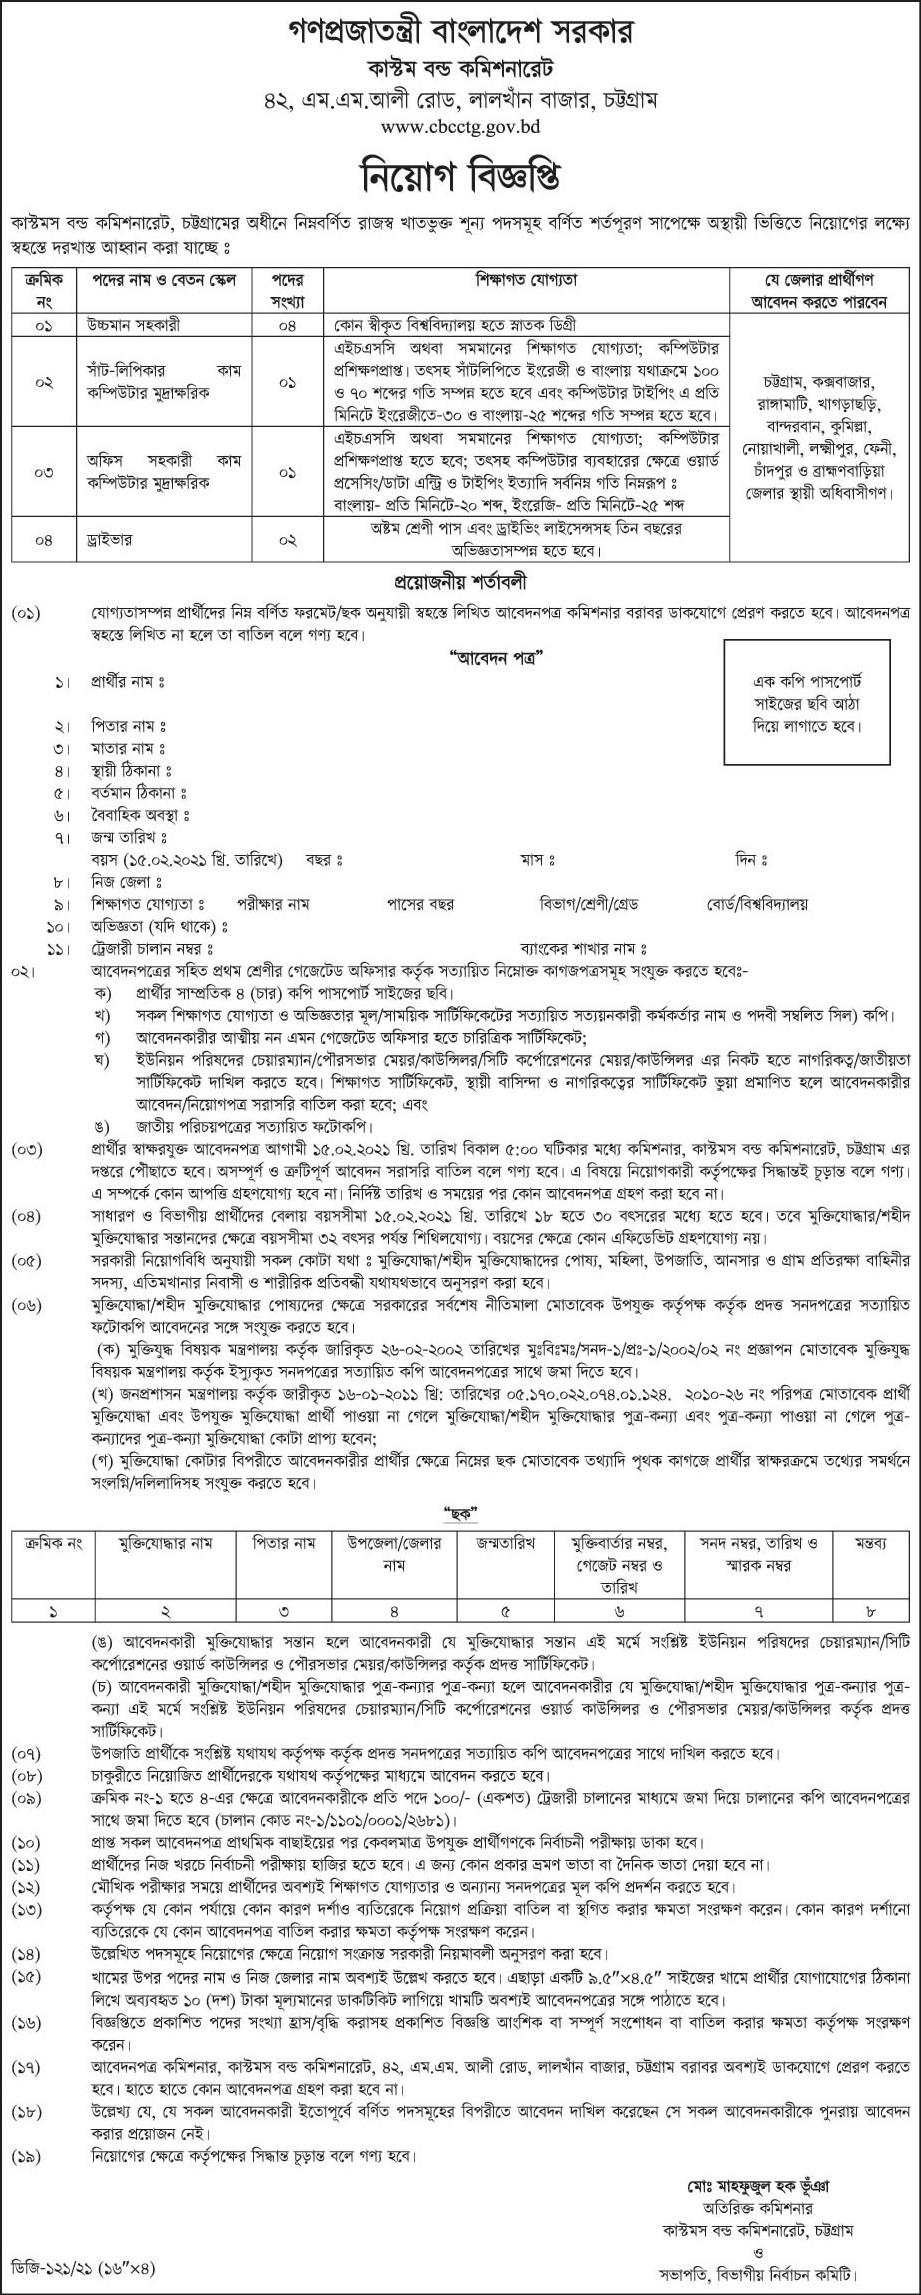 CBC Bangladesh Job Circular